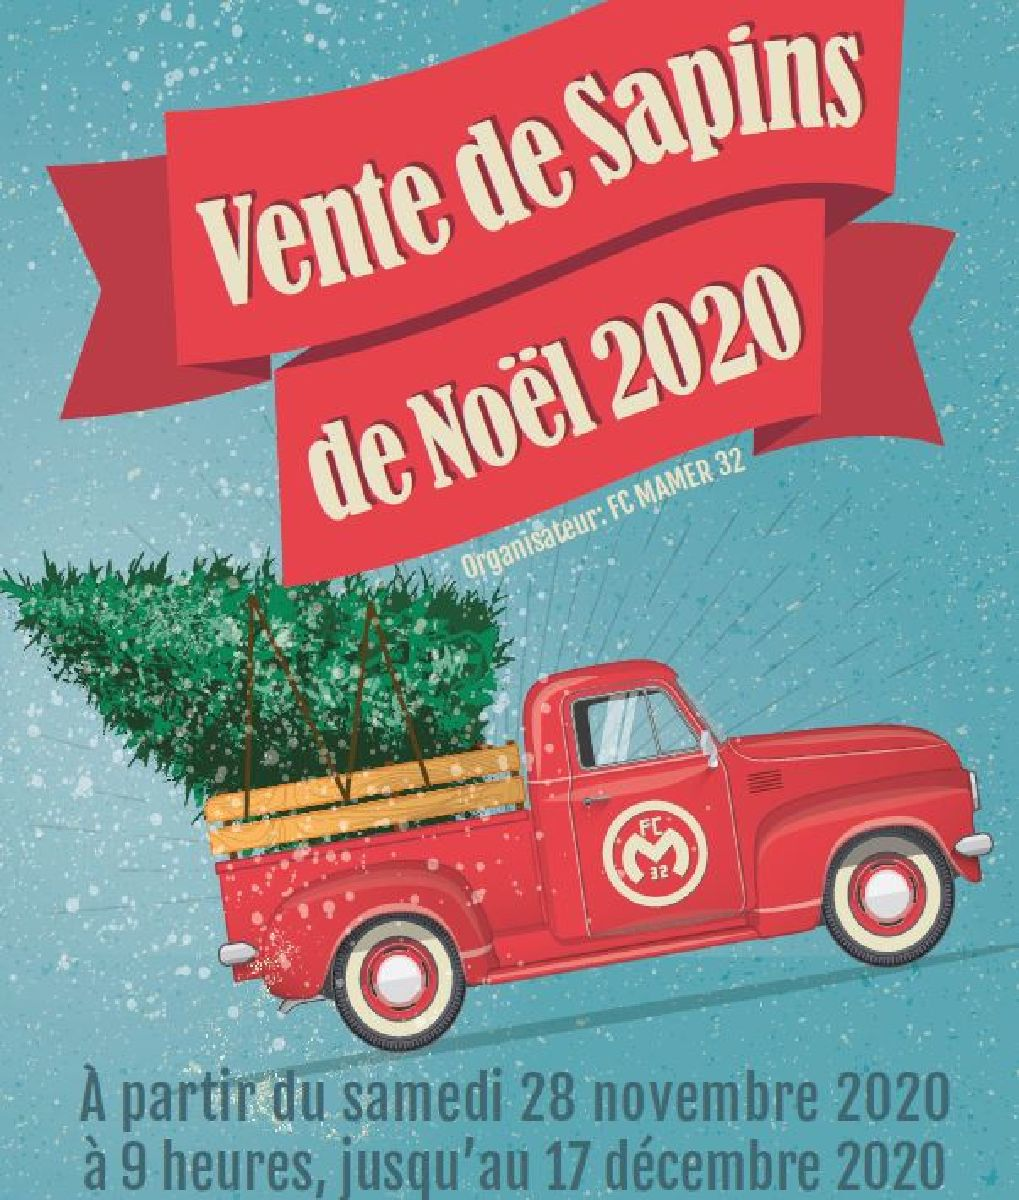 FC MAMER 32: vente de sapins de Noël 2020